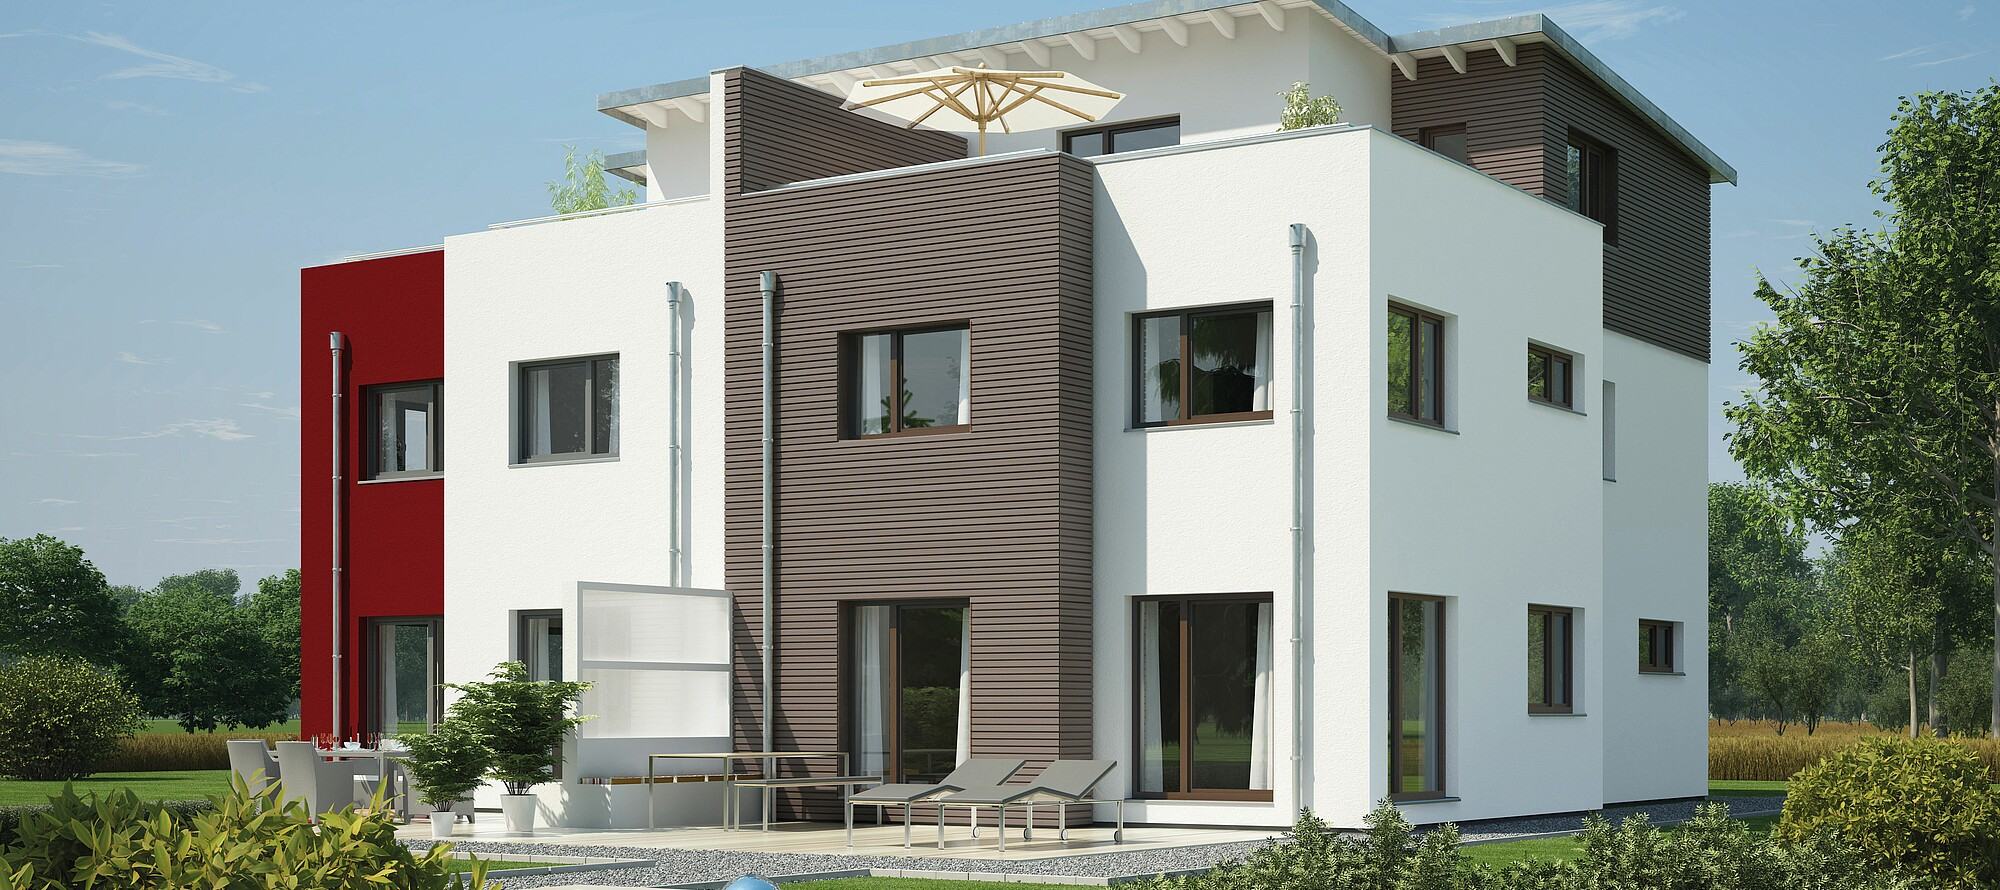 Fertighaus Doppelhaus 144 Hanse Haus